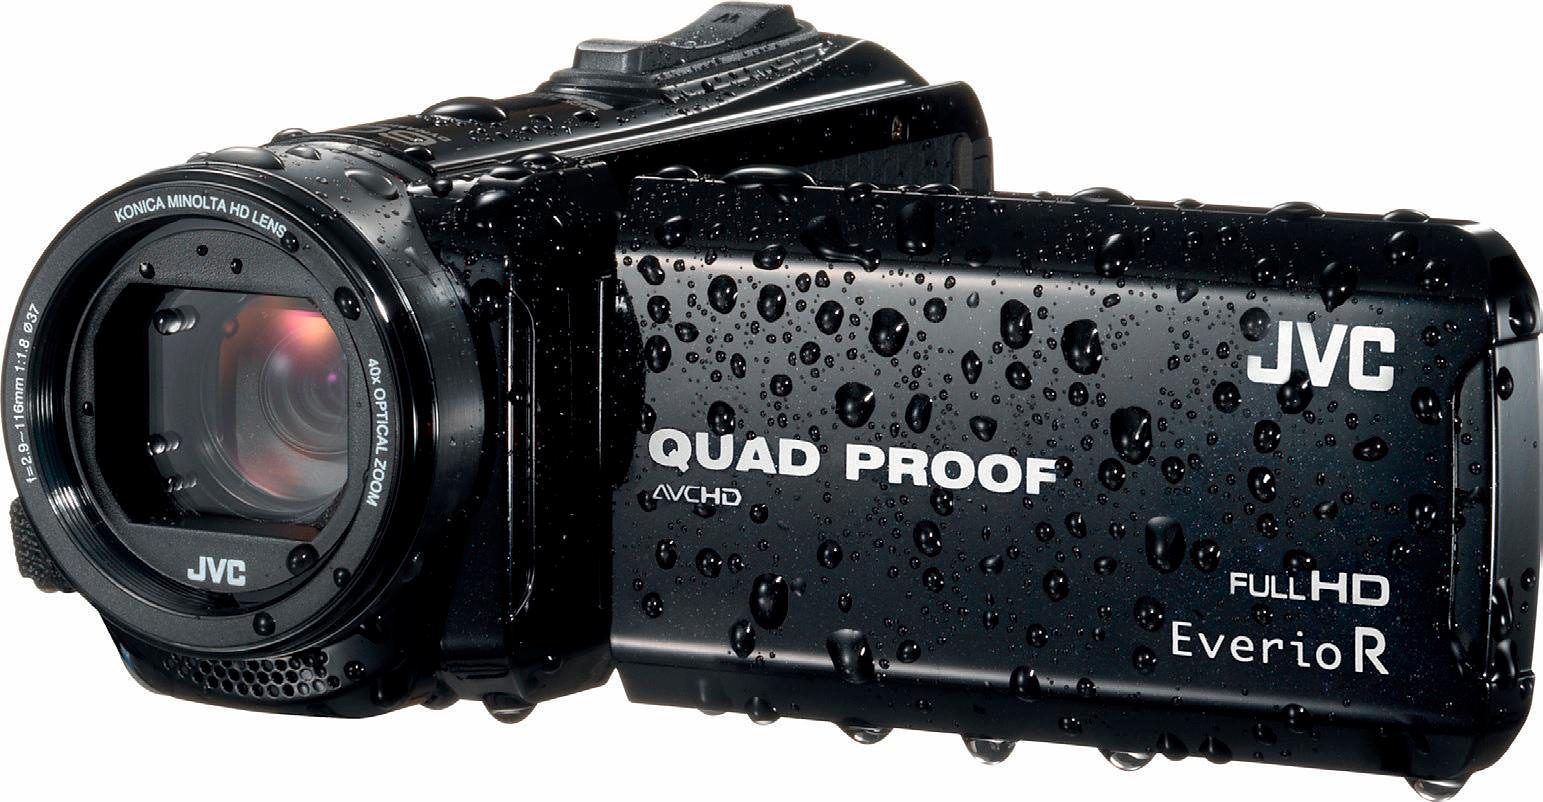 JVC GZ-R410BEU 1080p (Full HD) Camcorder, Videoleuchte, Staubfest